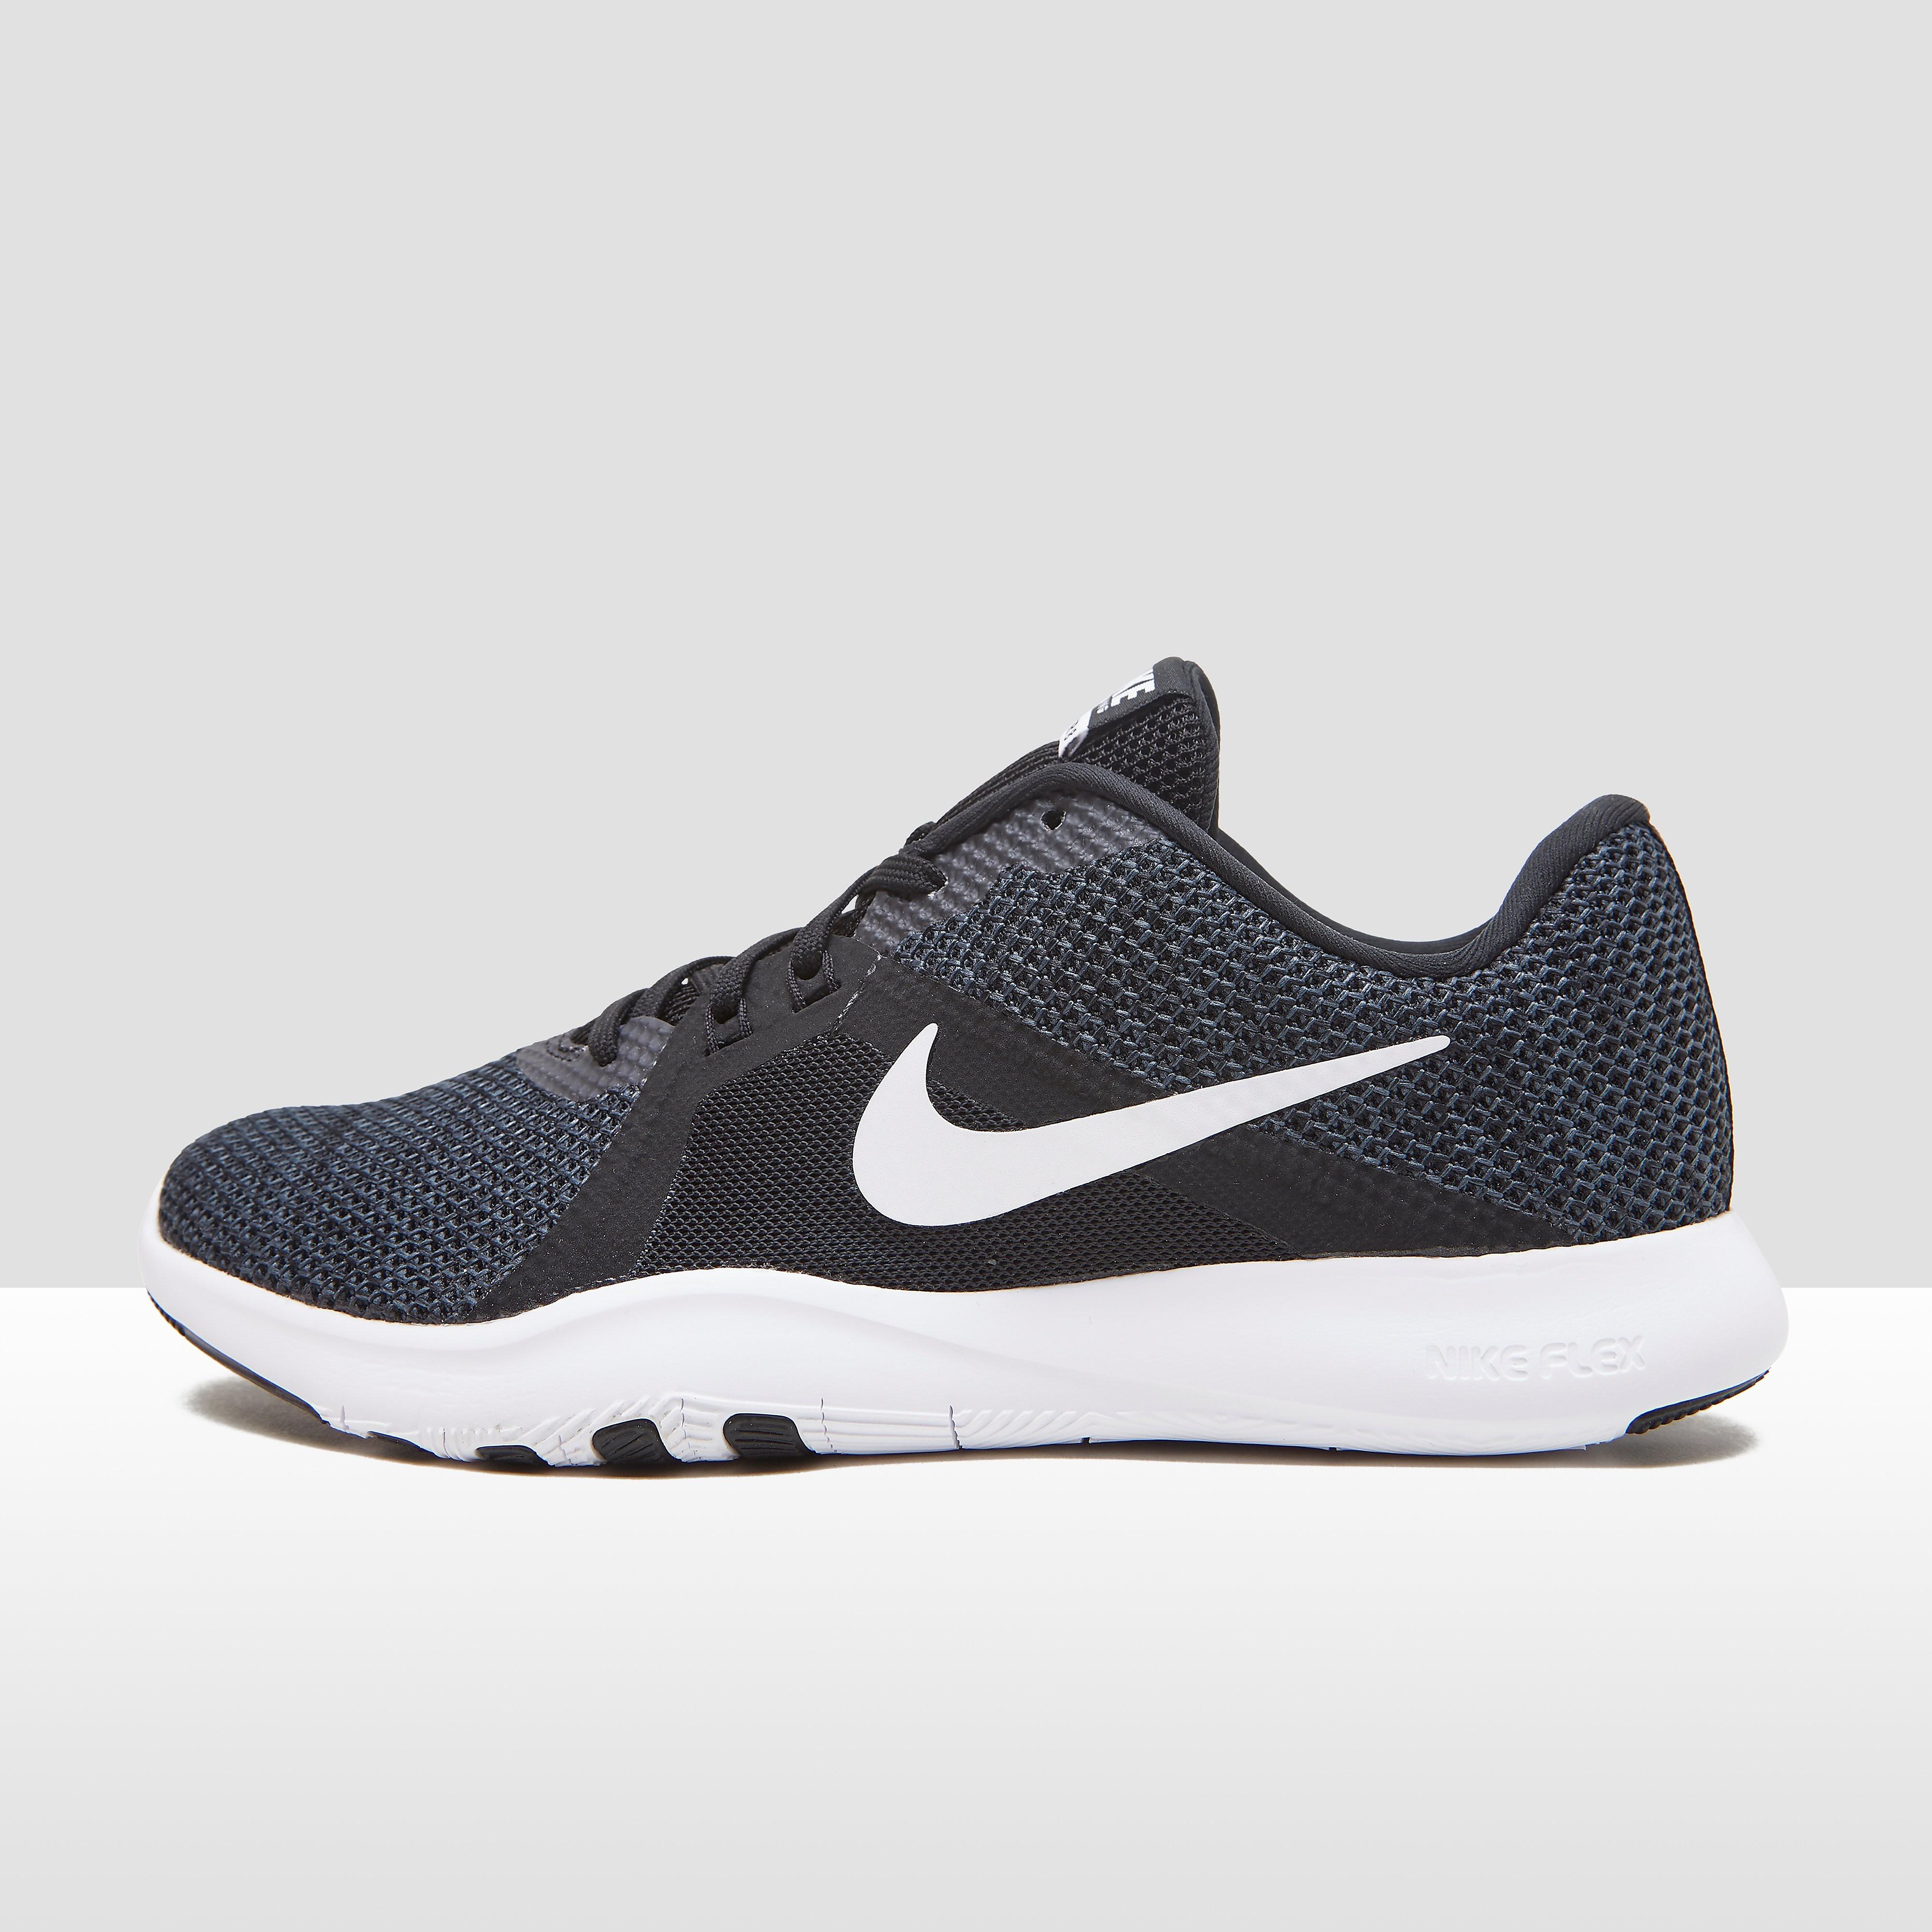 Nike - Zoom Chaussures De Fitness Air Conditionné - Femmes - Chaussures - Noir - 40,5